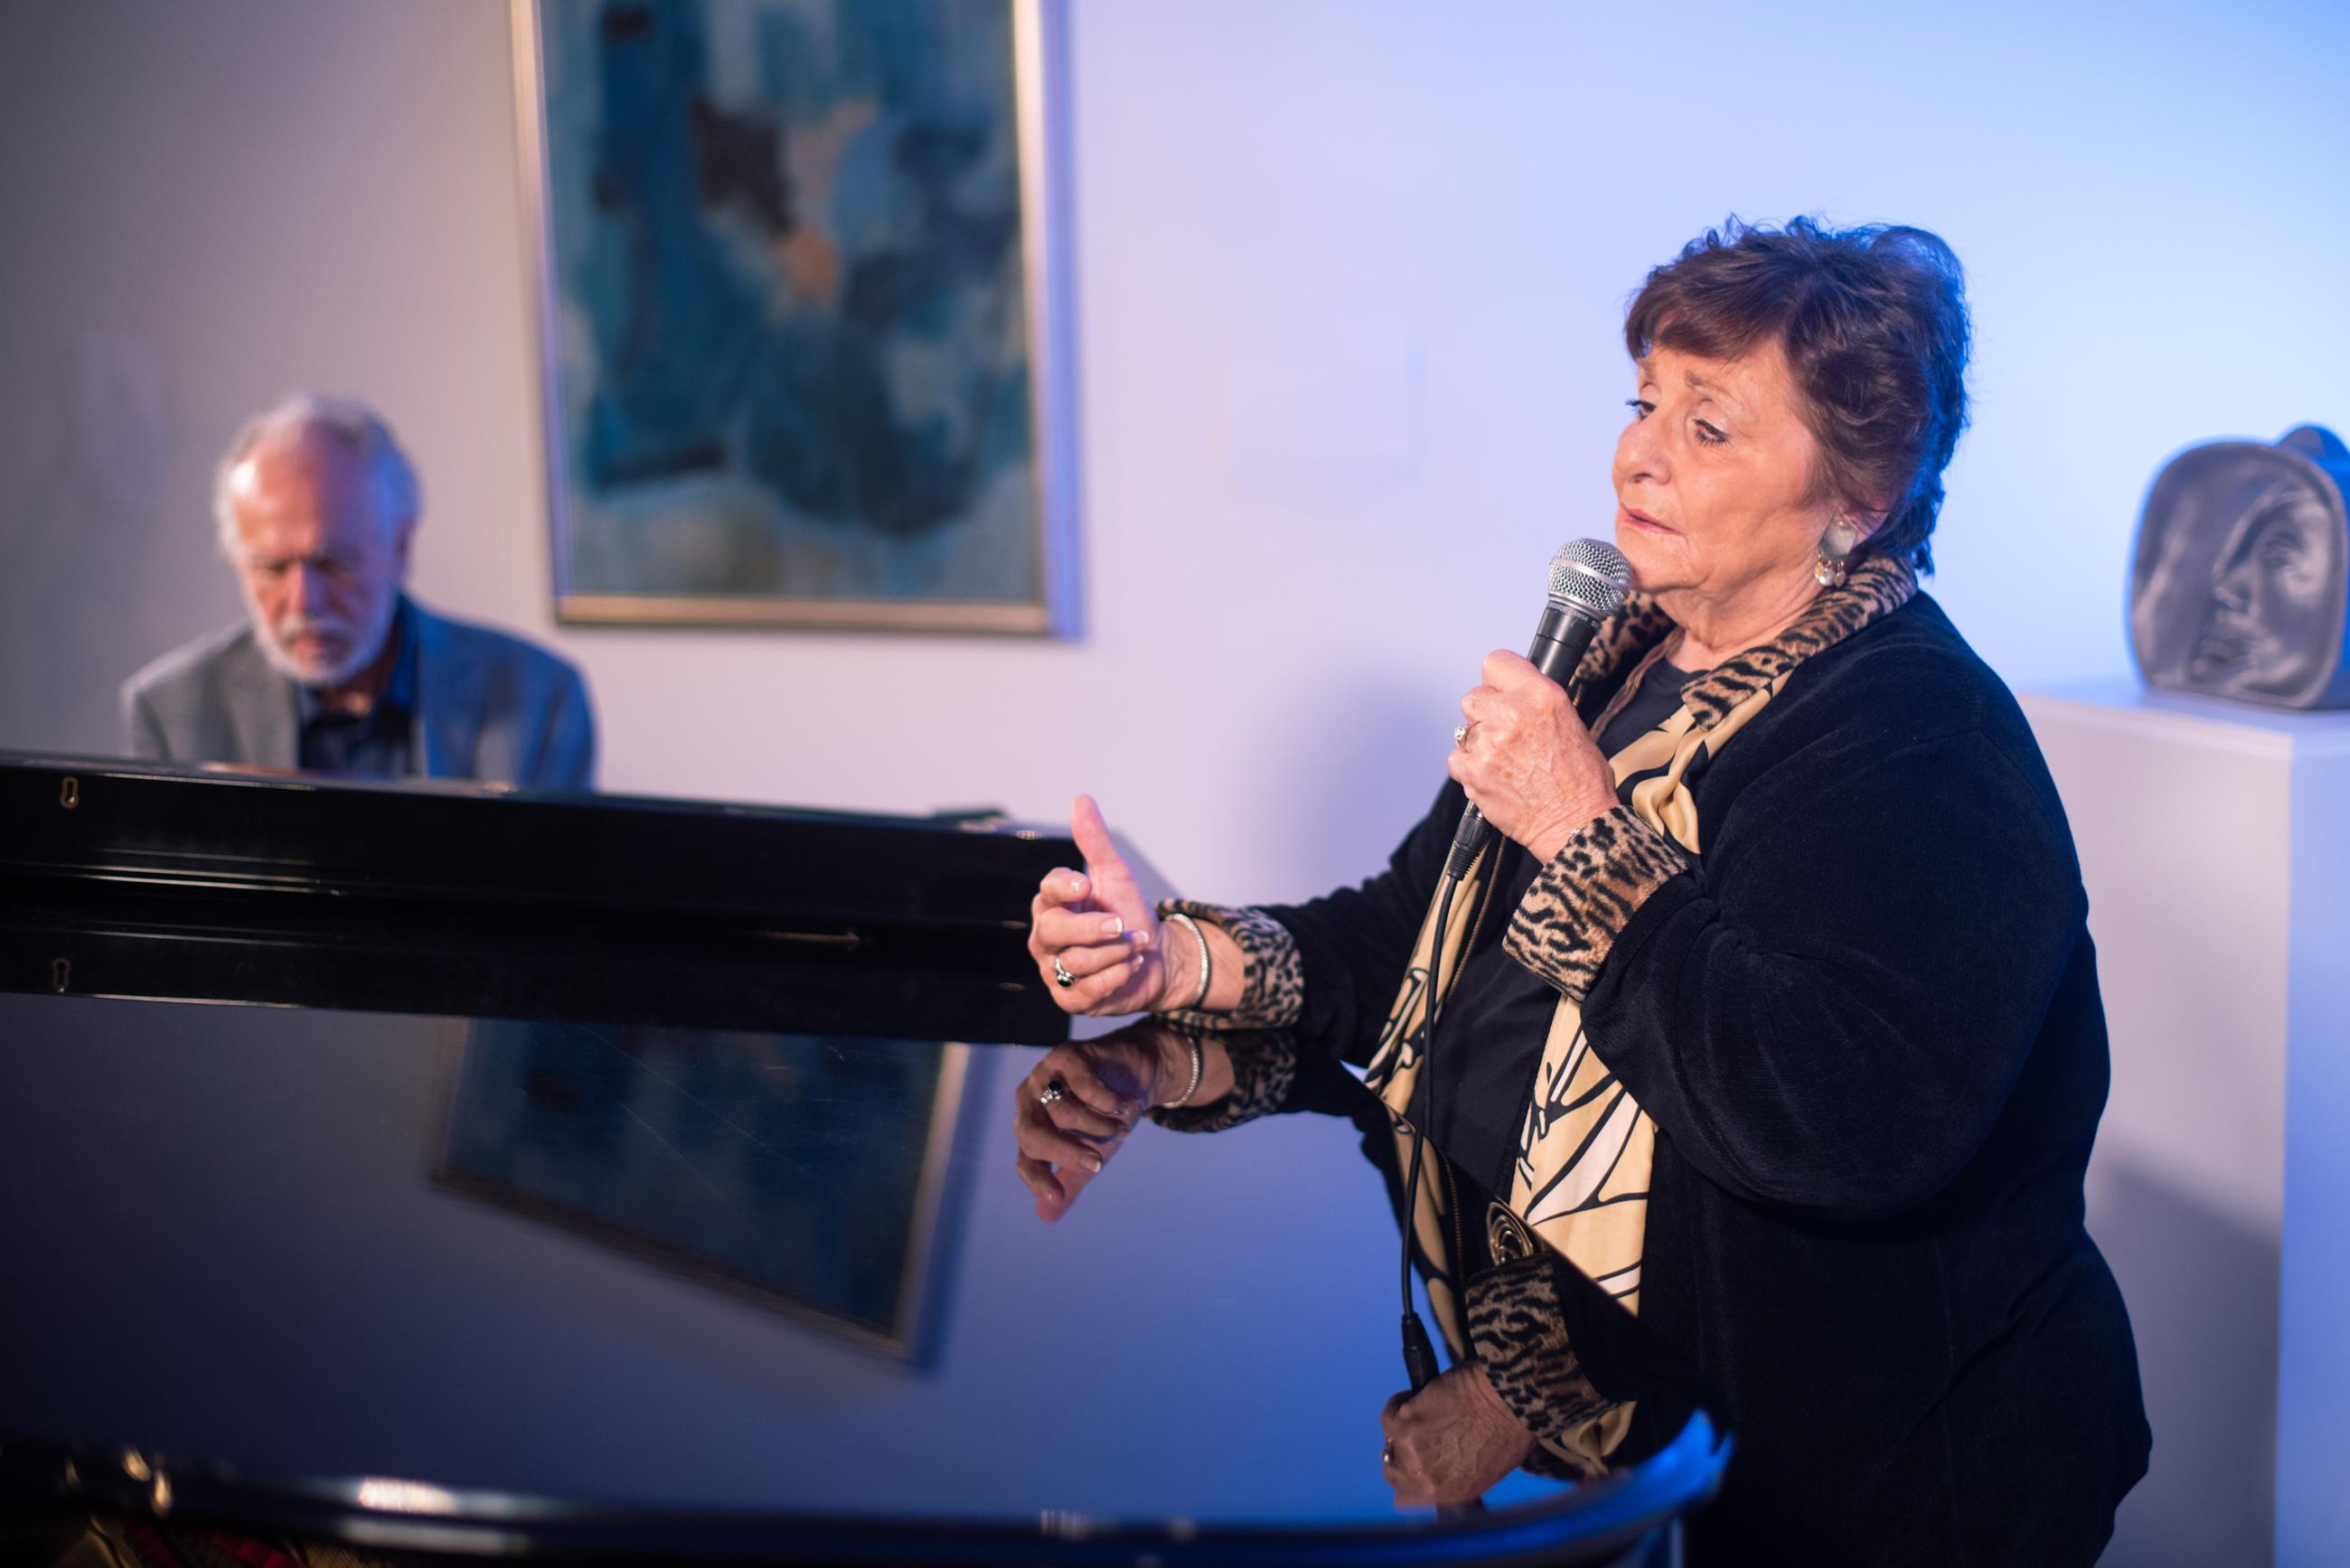 Cathy Chemi singing.